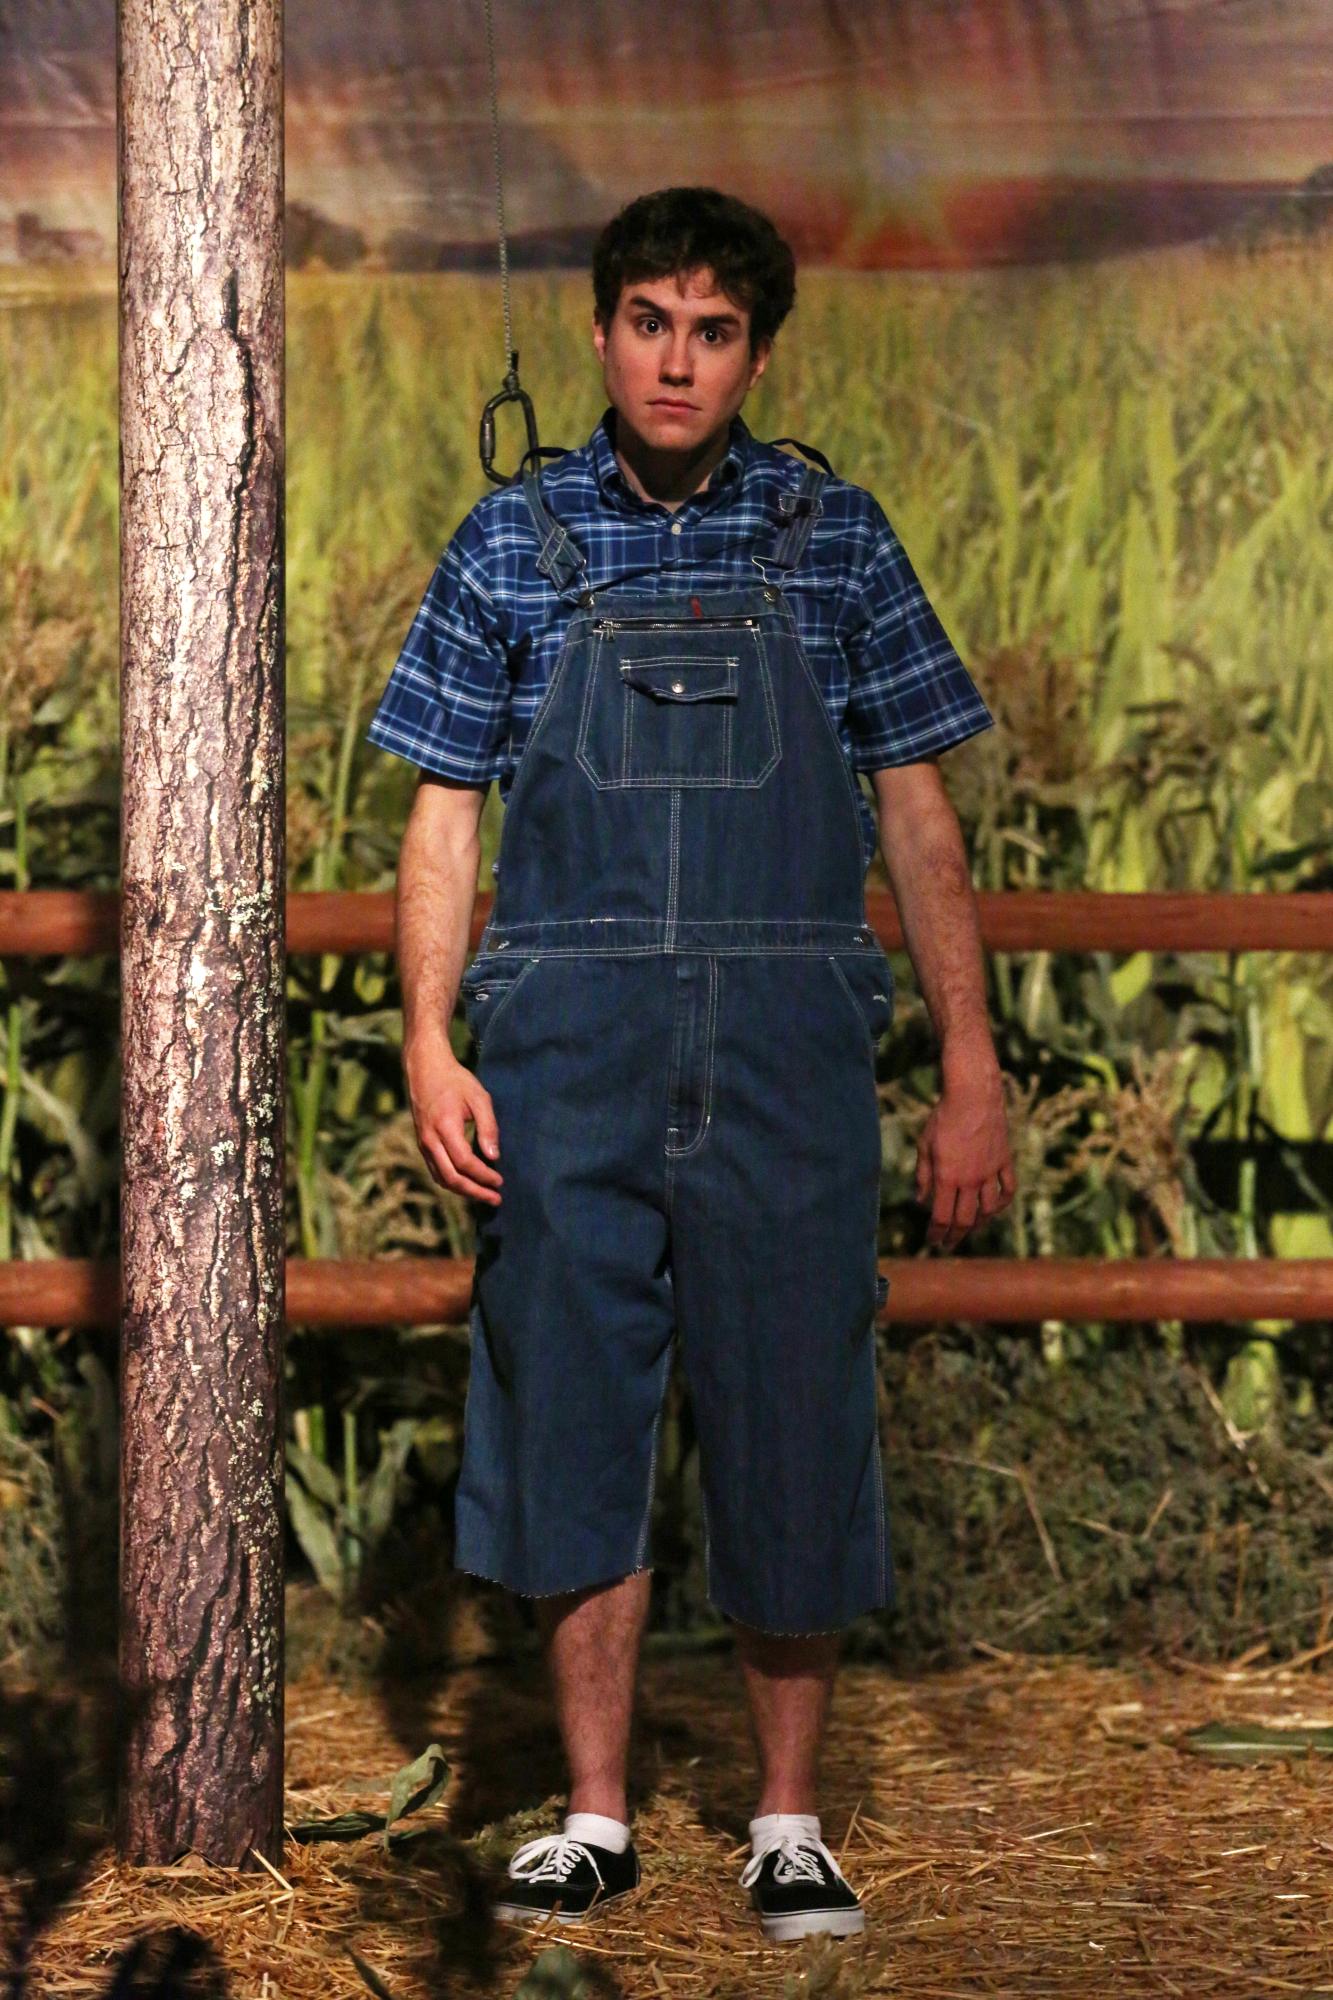 Big Brother Steve wins HOH